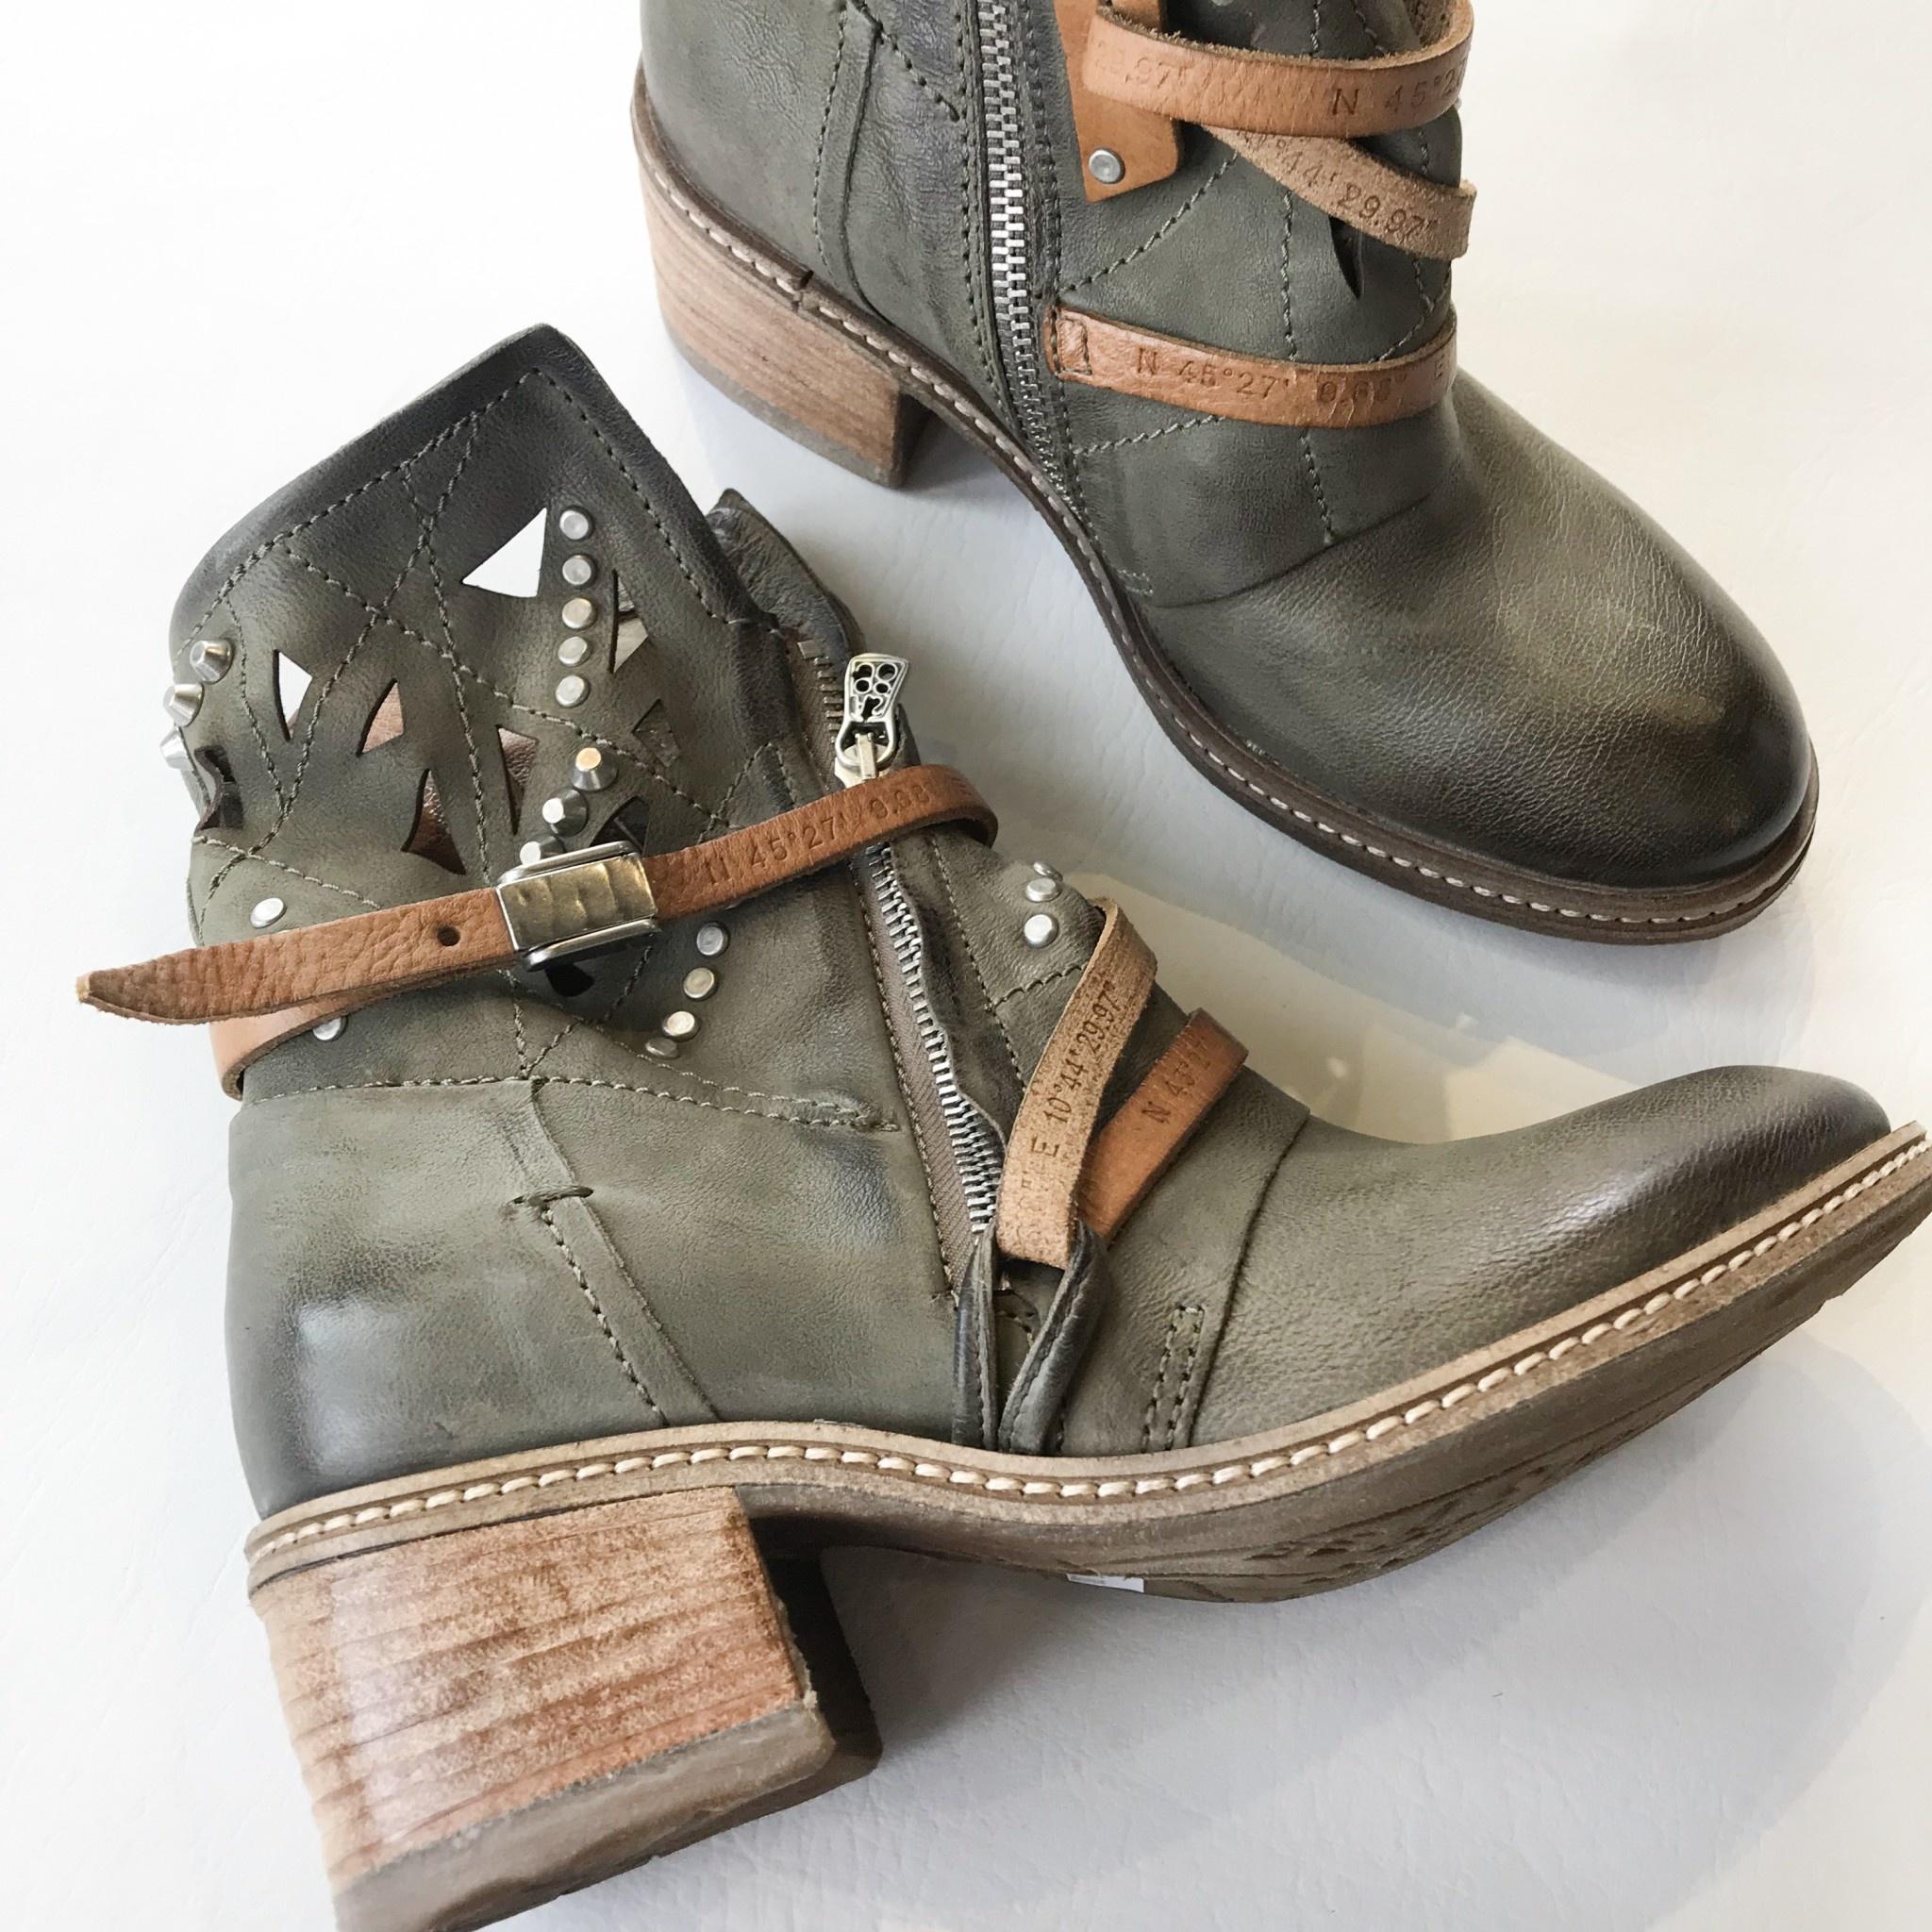 AS98 wyatt boot